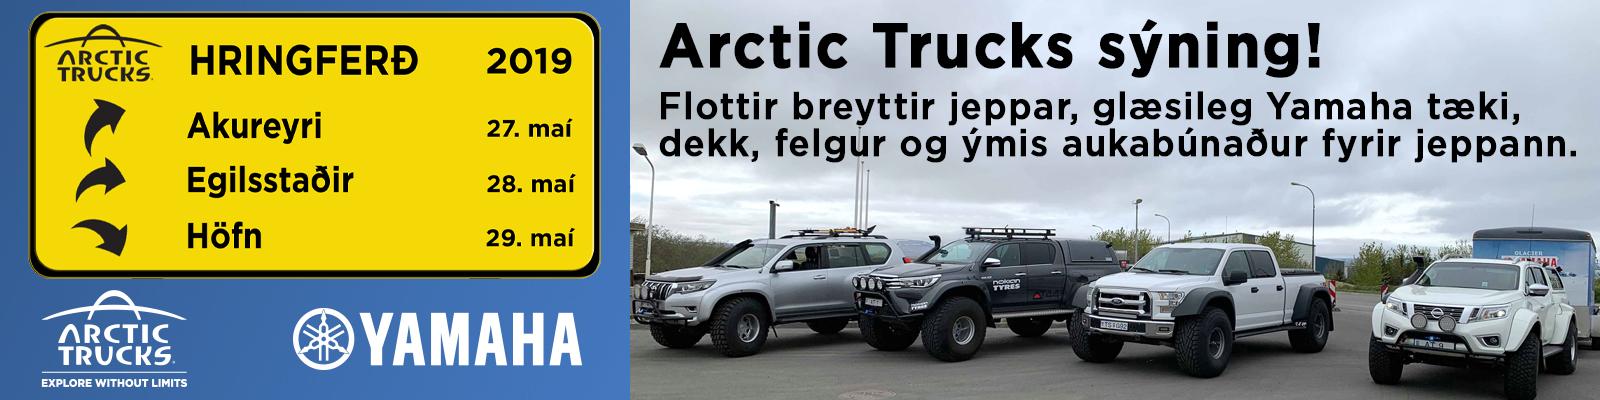 Artic Trucks 2019